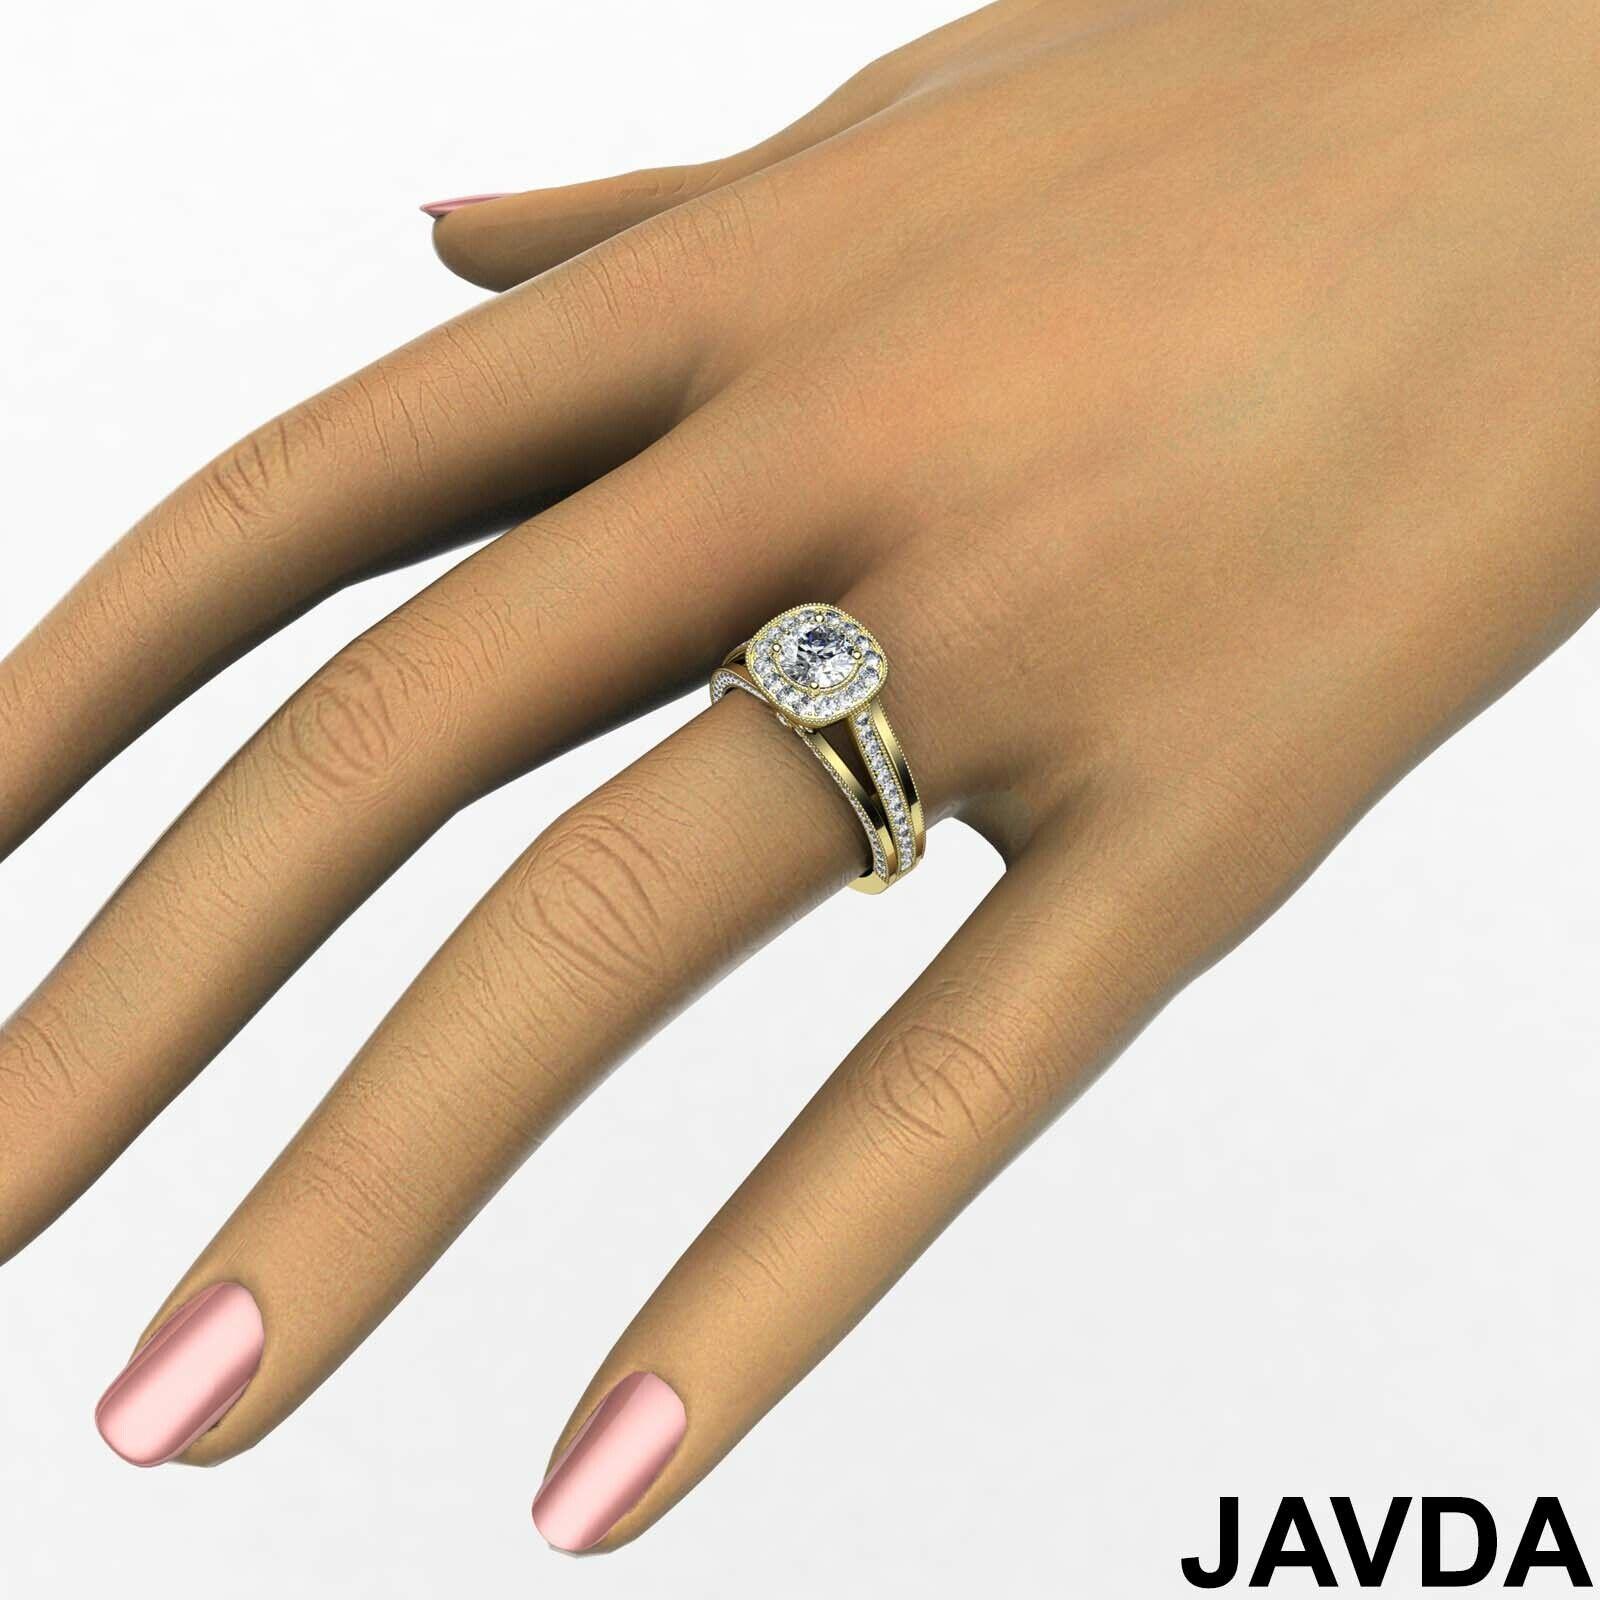 1.6ctw Bridge Accent Round Diamond Engagement Ring GIA E-VVS2 White Gold Rings 10